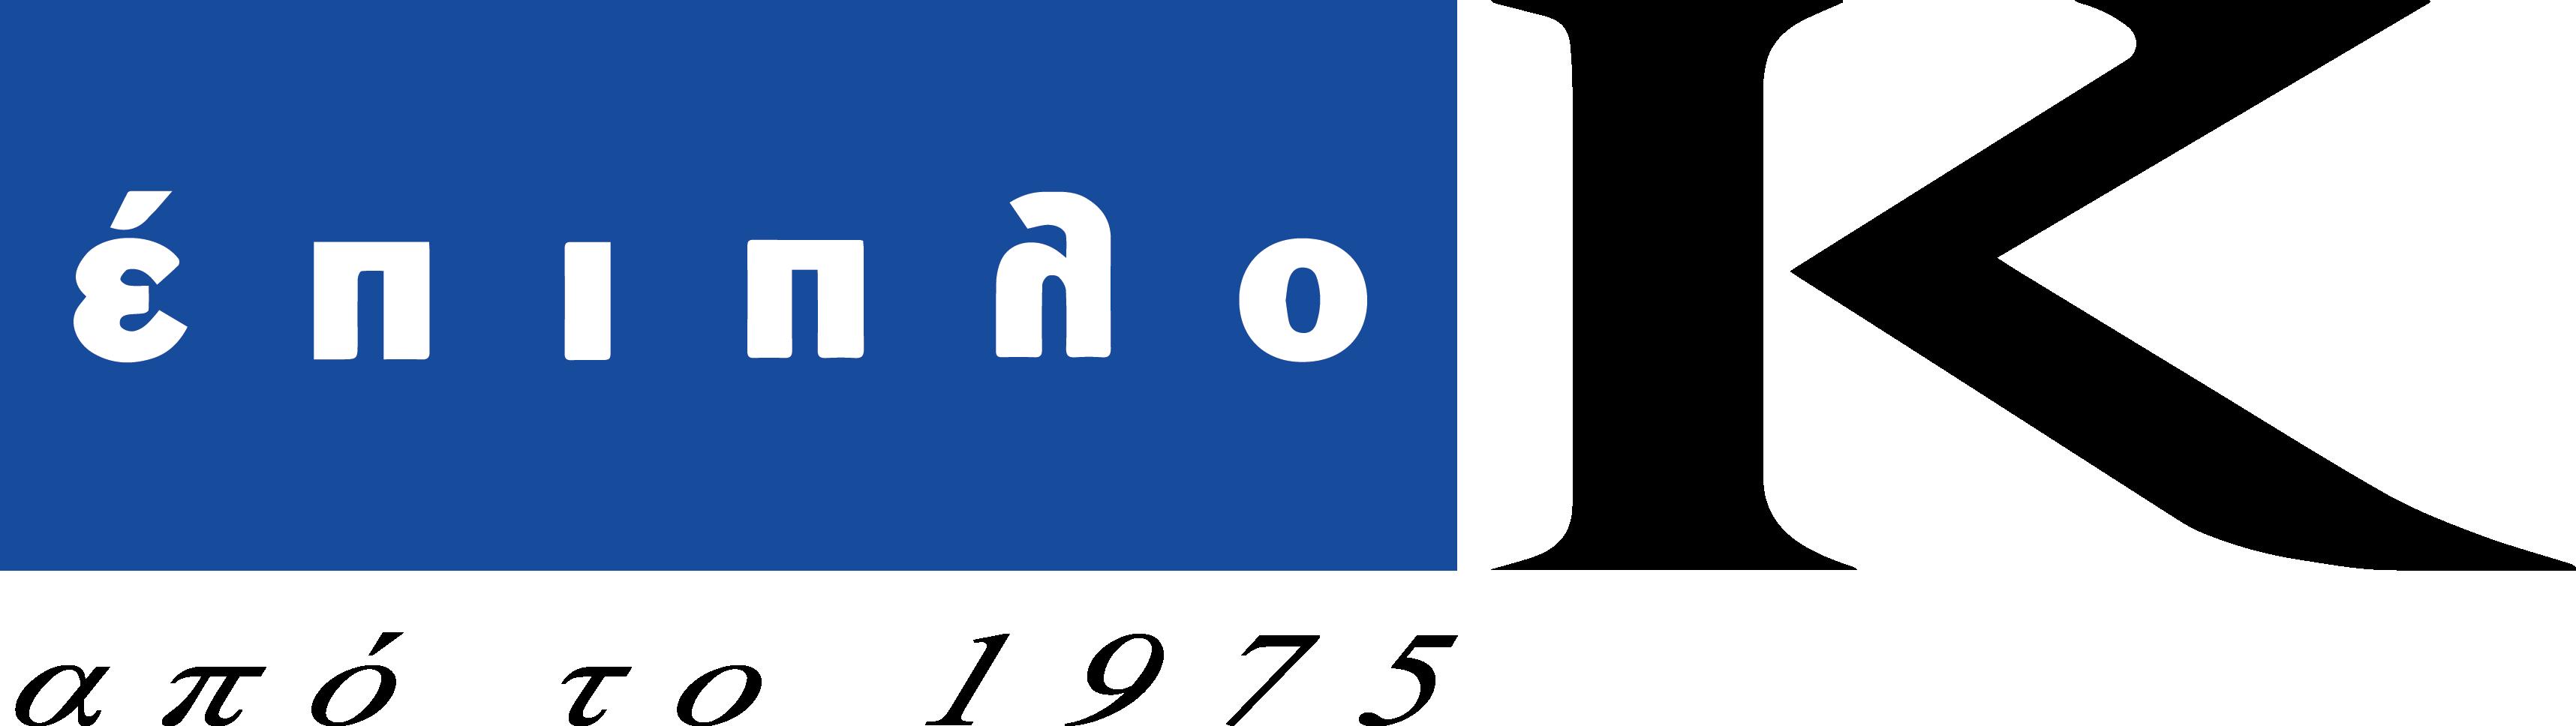 Epiplo K